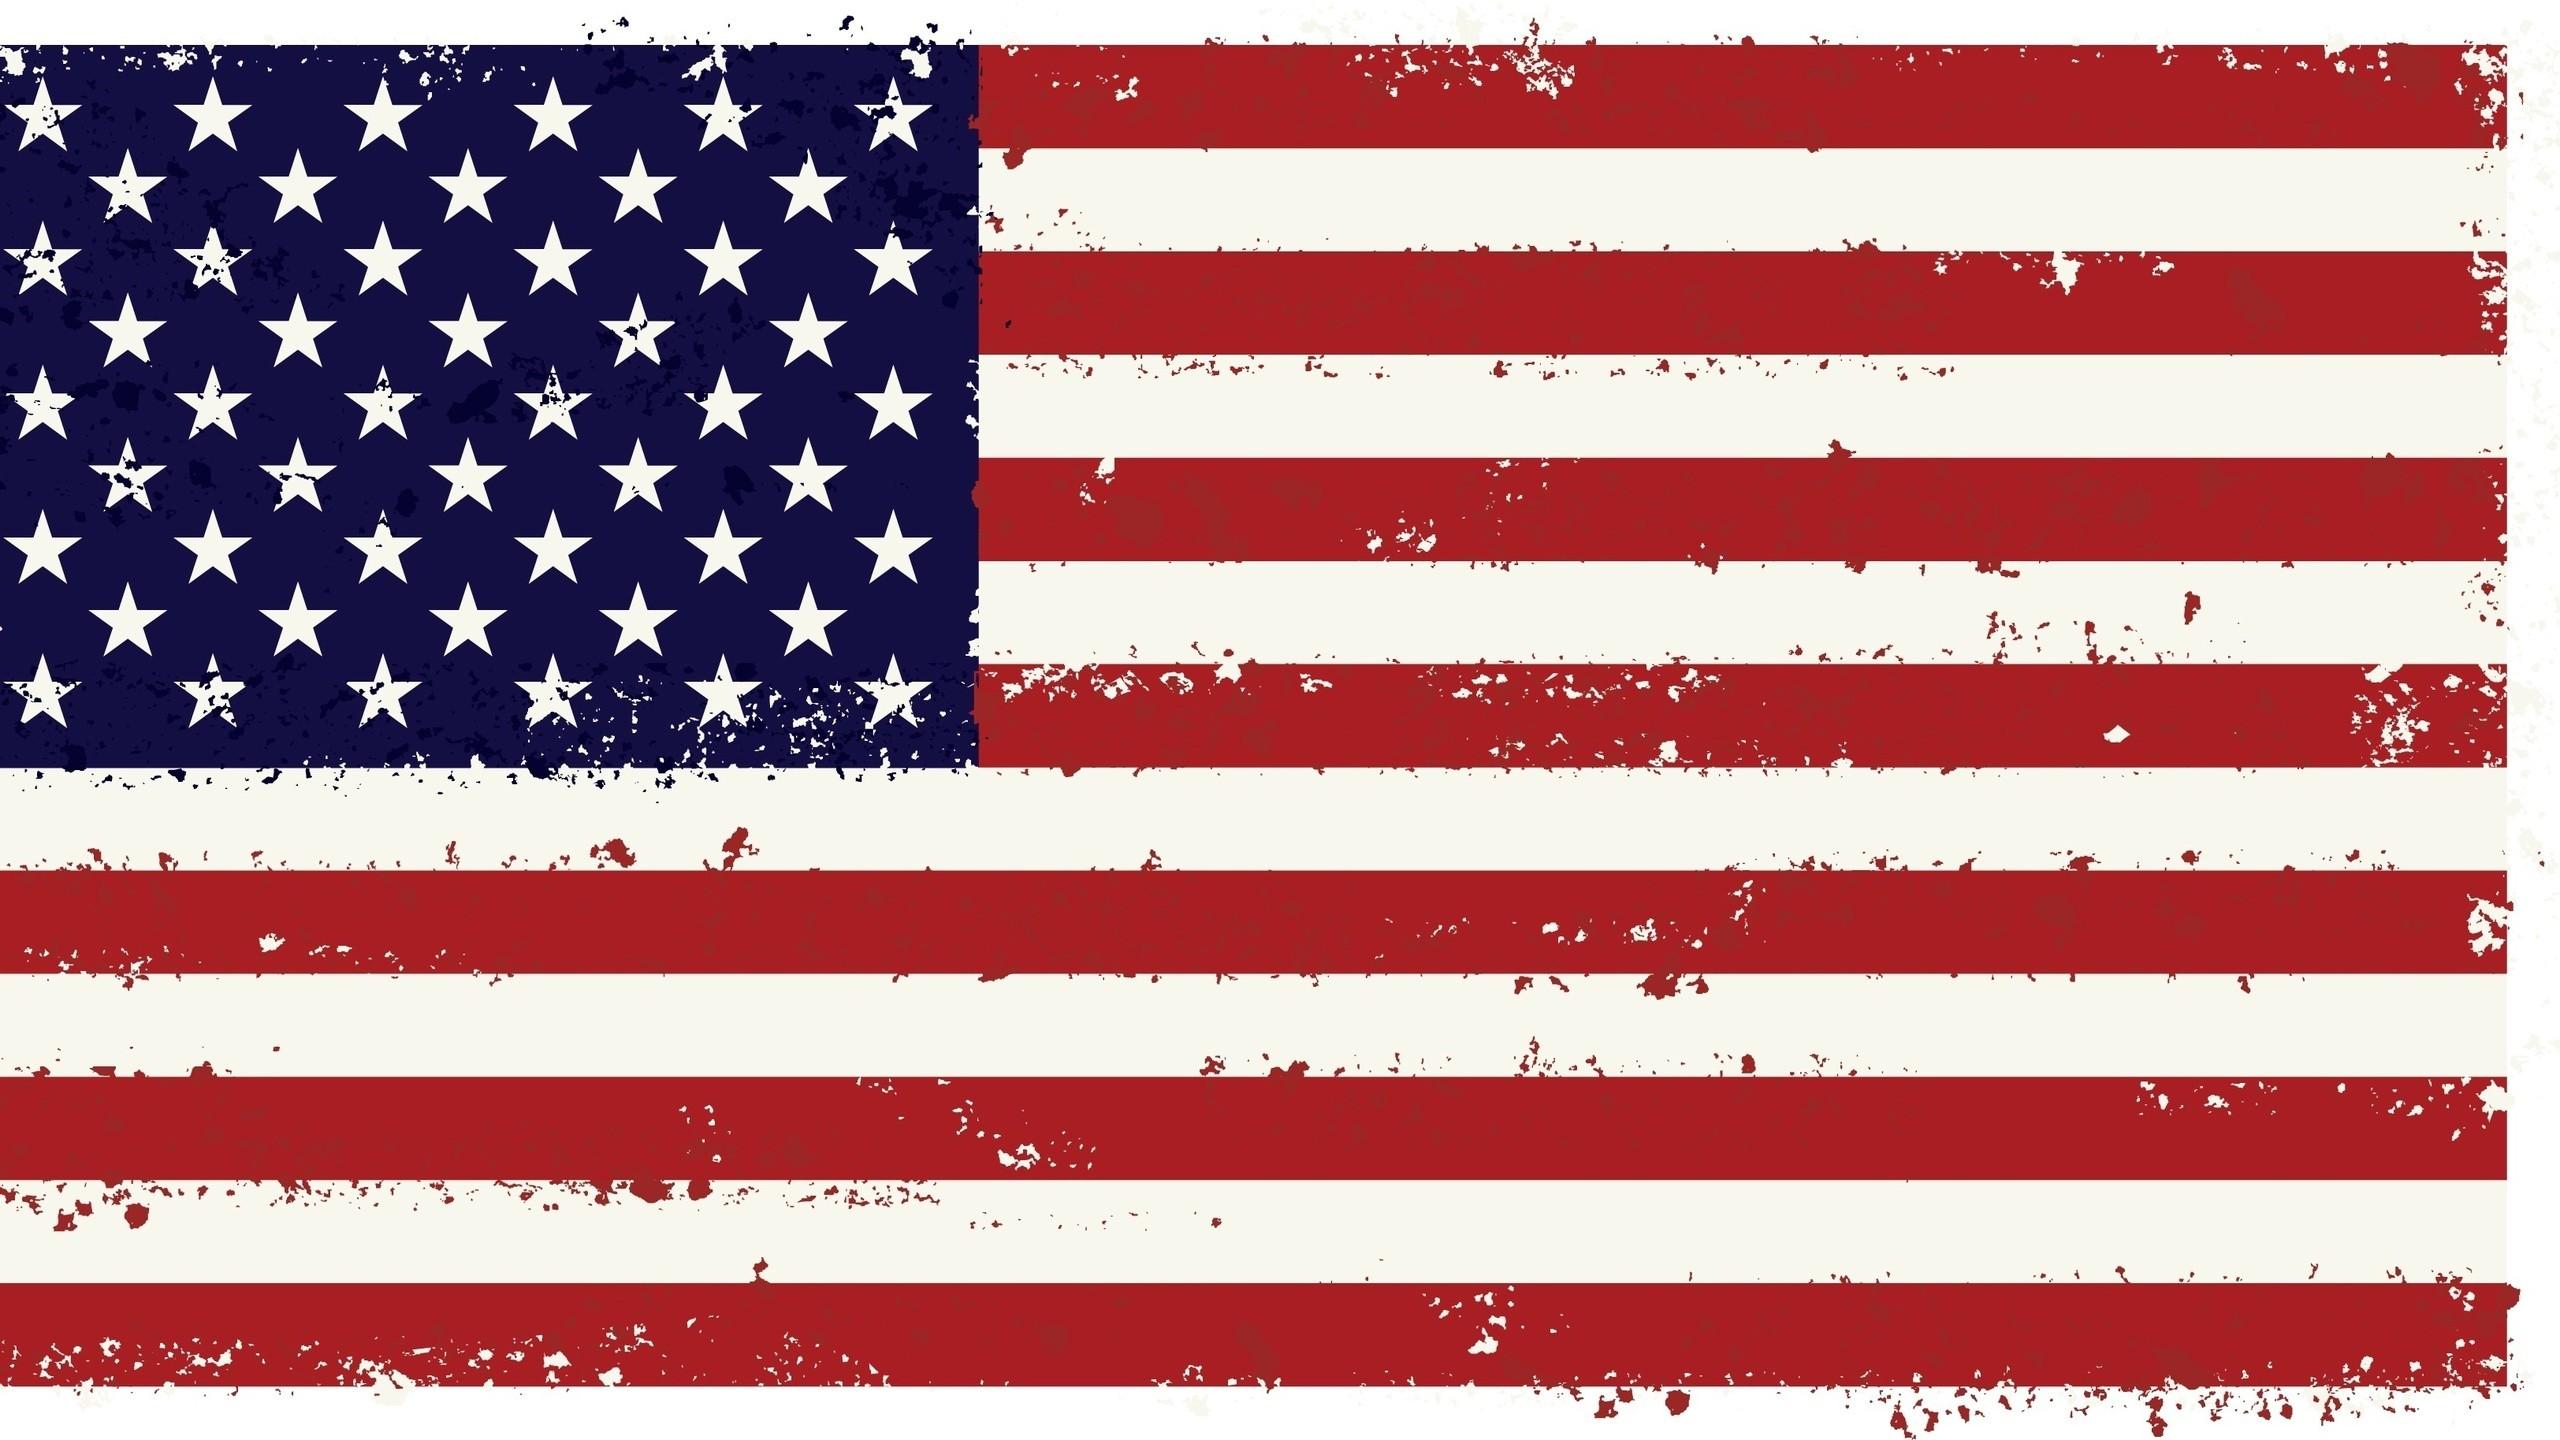 Res: 2560x1440, Add media Report RSS USA Flag Wallpaper (view original)